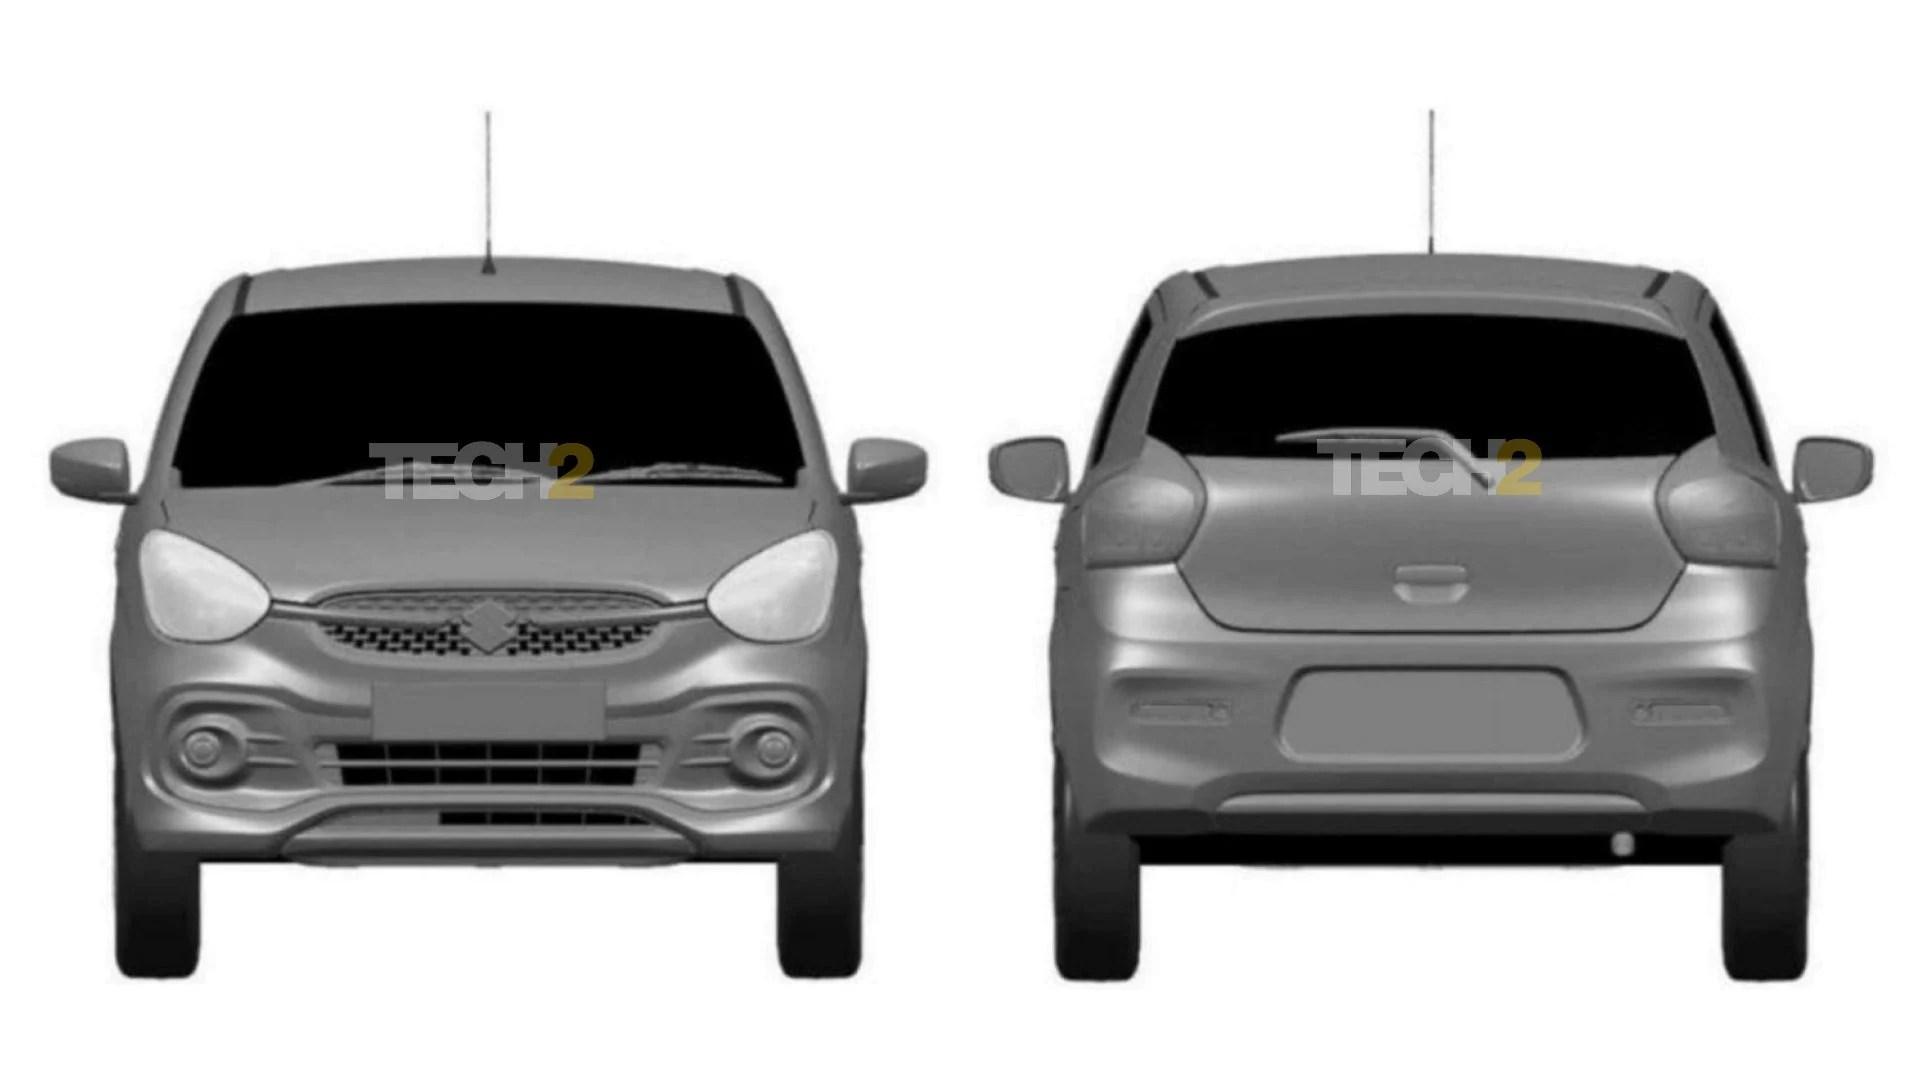 New Maruti Suzuki Celerio design patents leaked, India launch scheduled for Q3 2021- Technology News, Gadgetclock